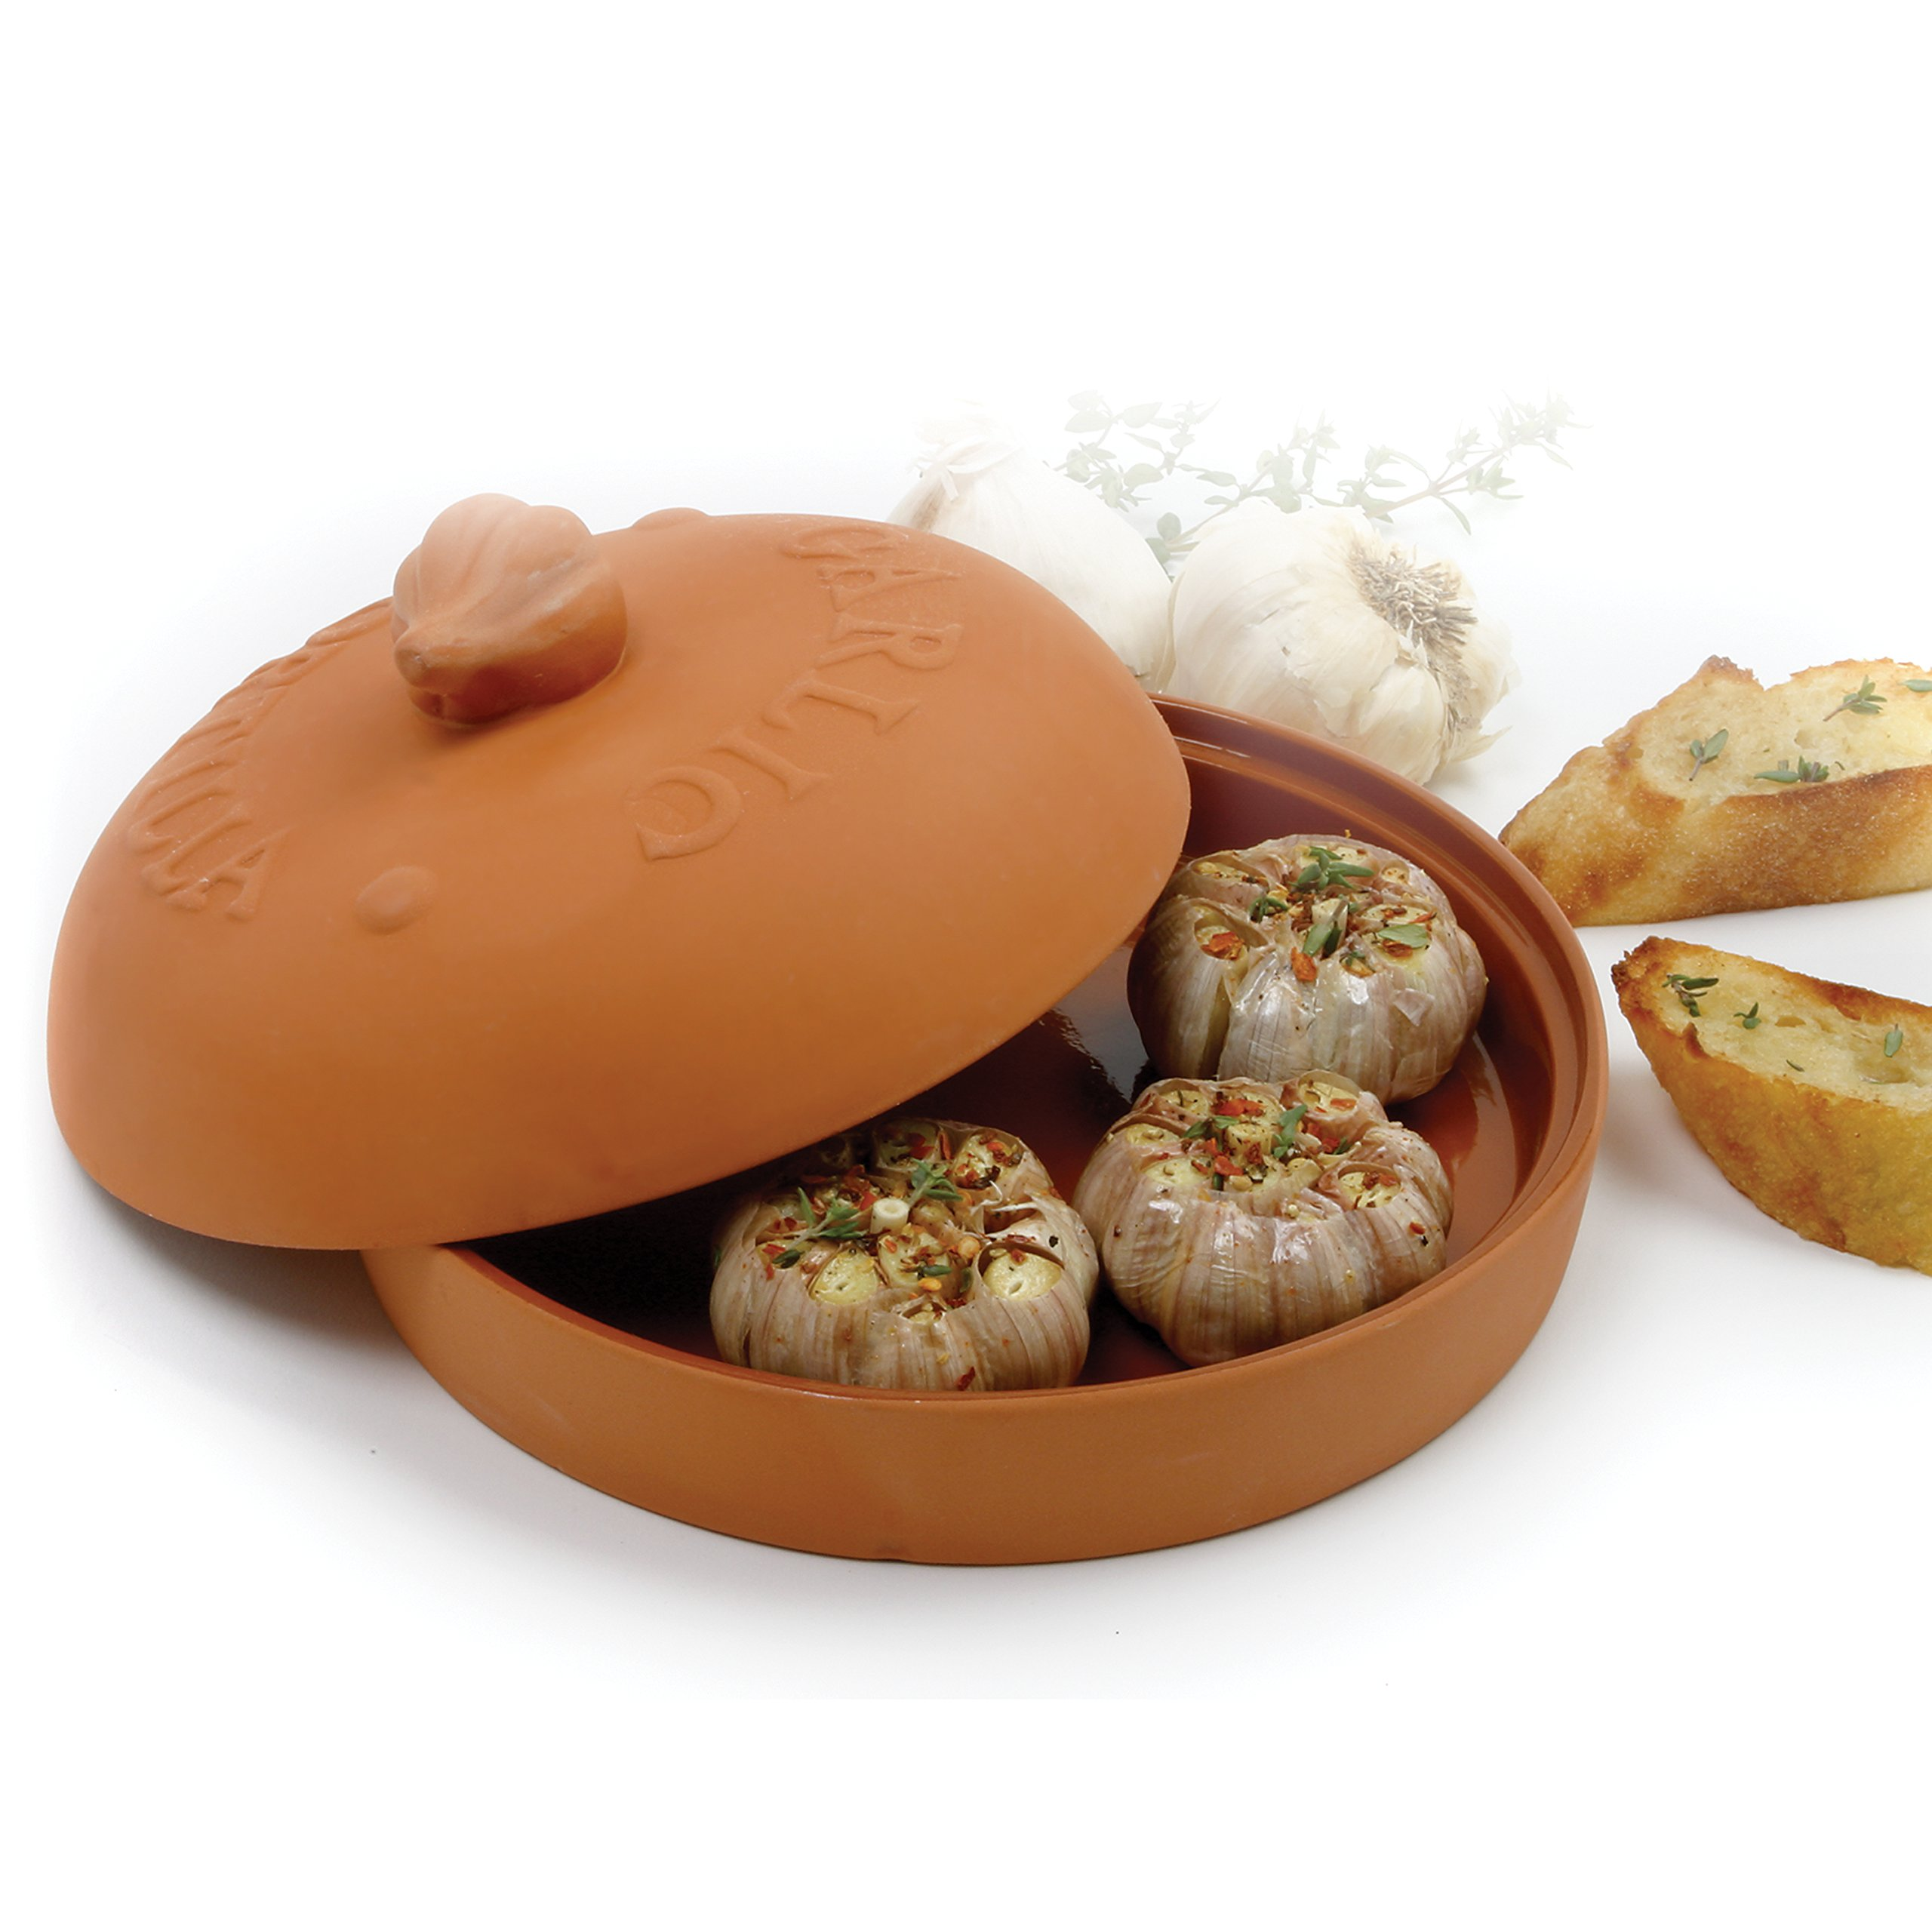 Norpro 1064 Garlic Baker/Tortilla Warmer by Norpro